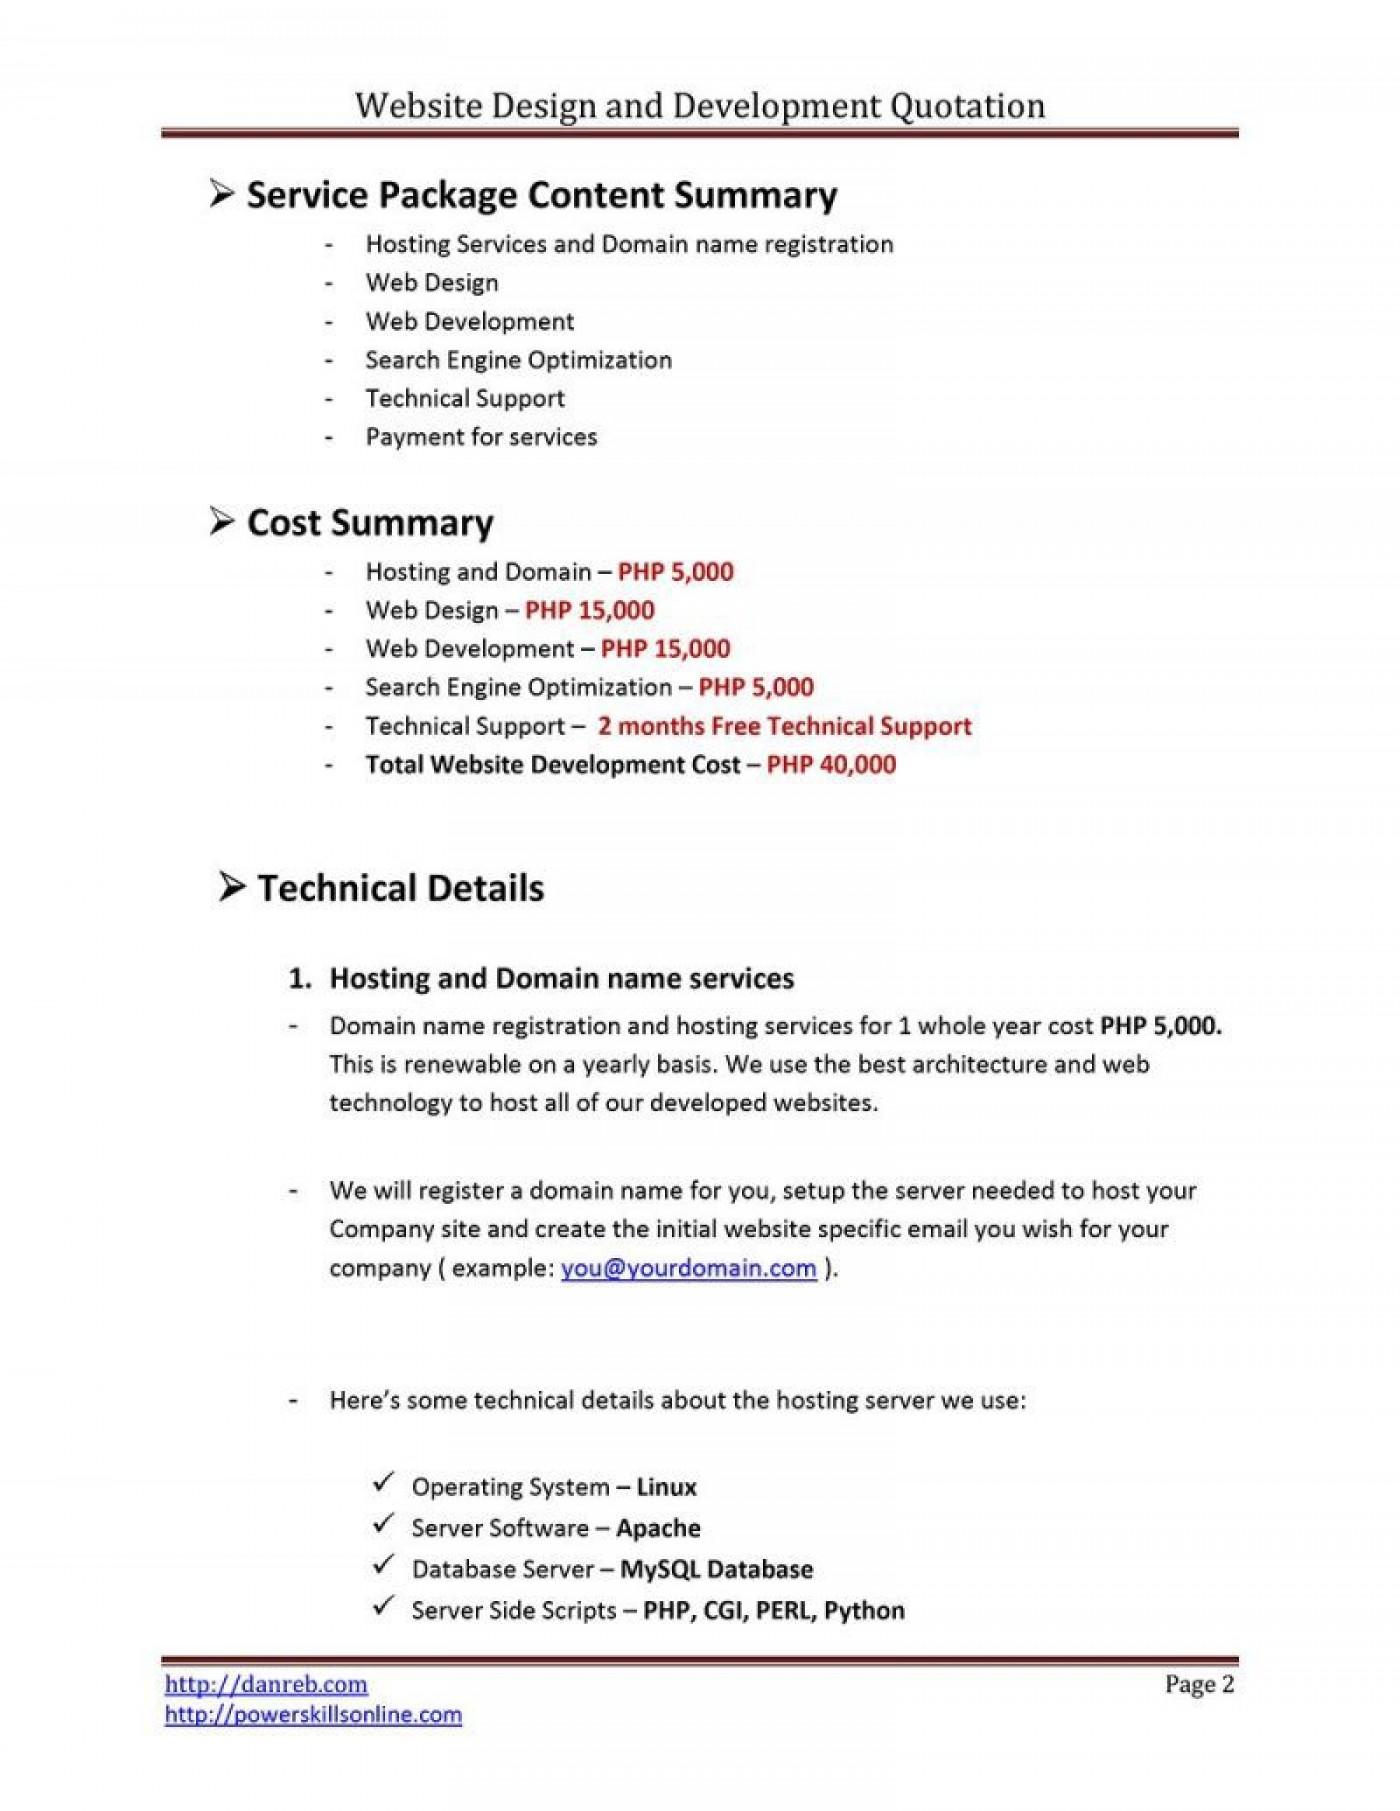 009 Fantastic Web Development Proposal Template Free High Def 1400